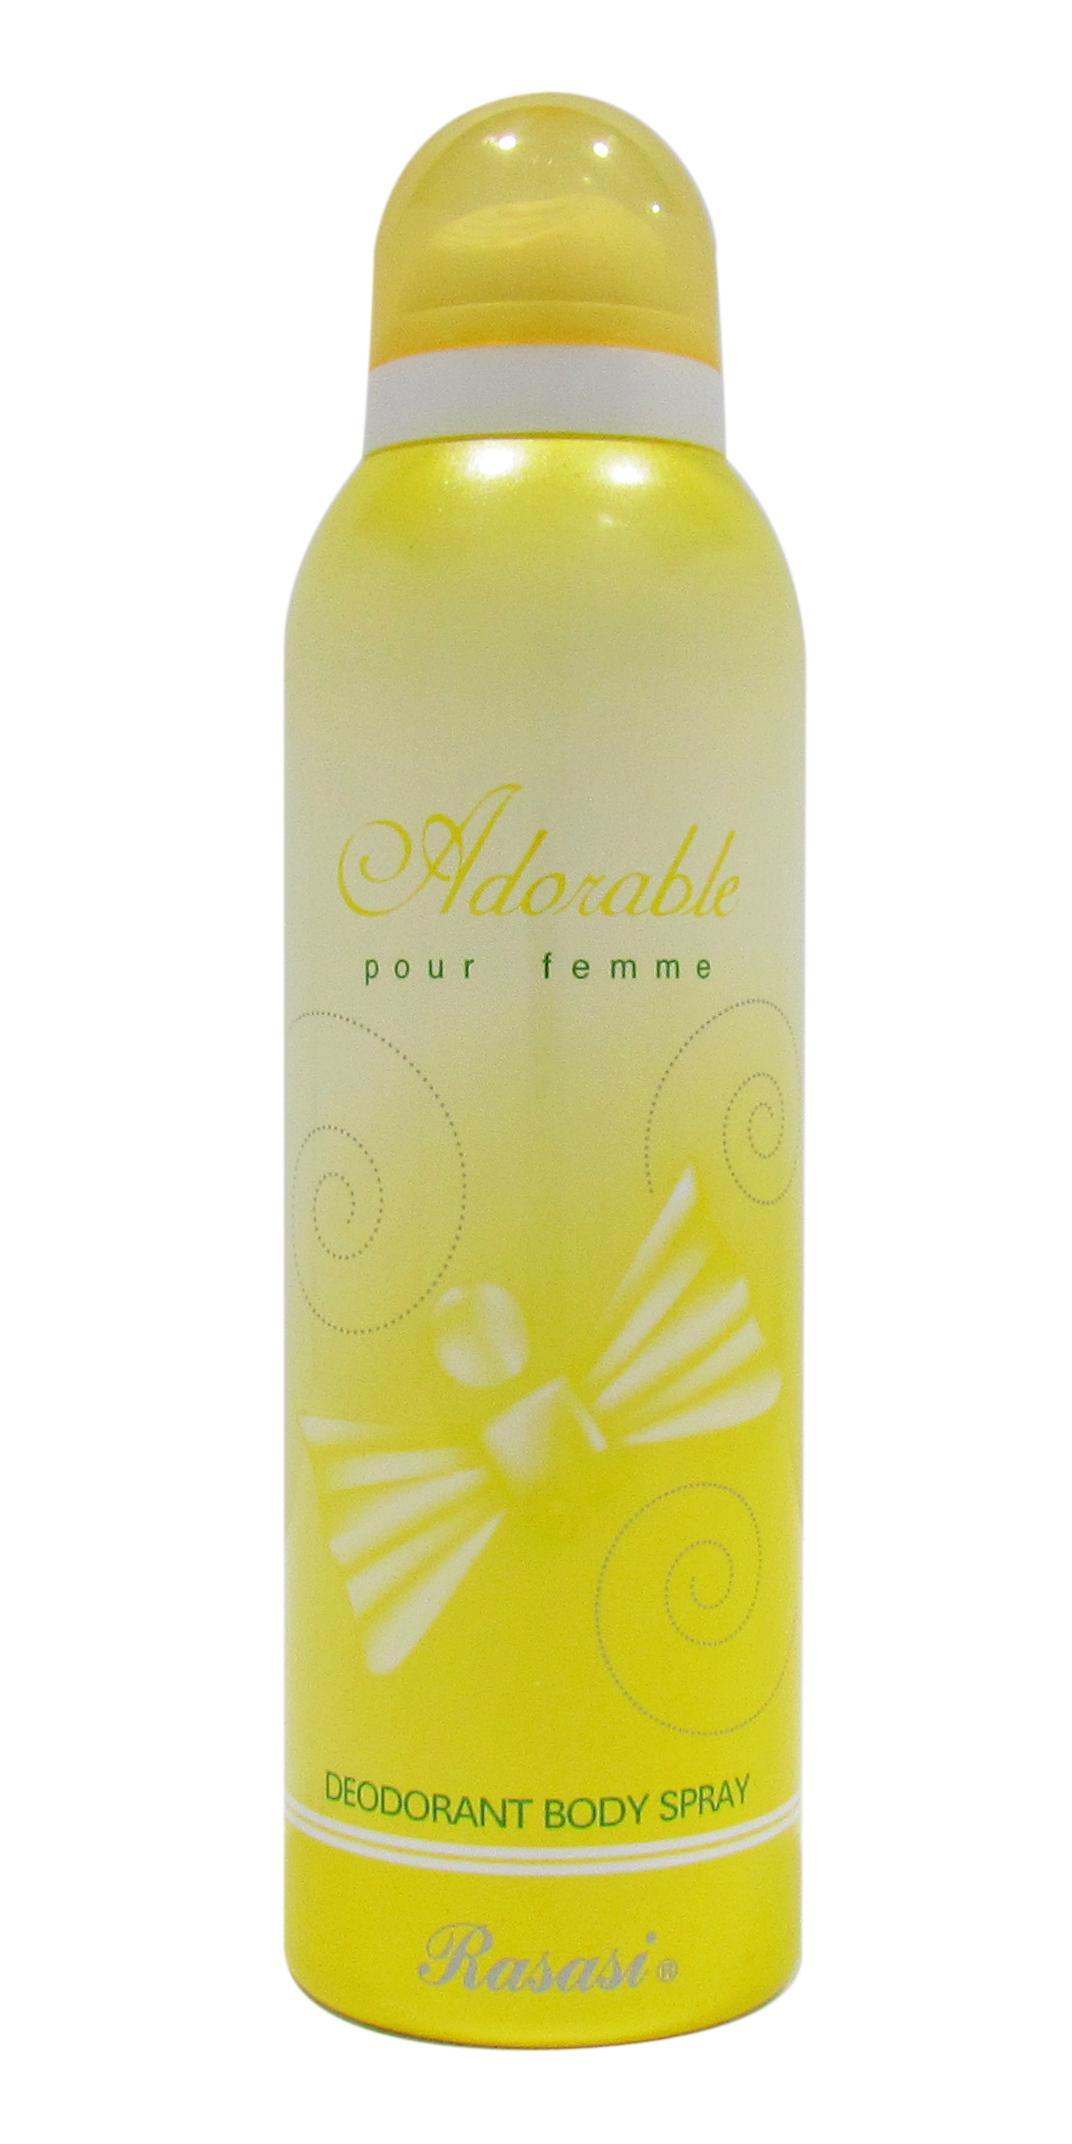 Rasasi Adorable Deodorant Spray For Women 200ml